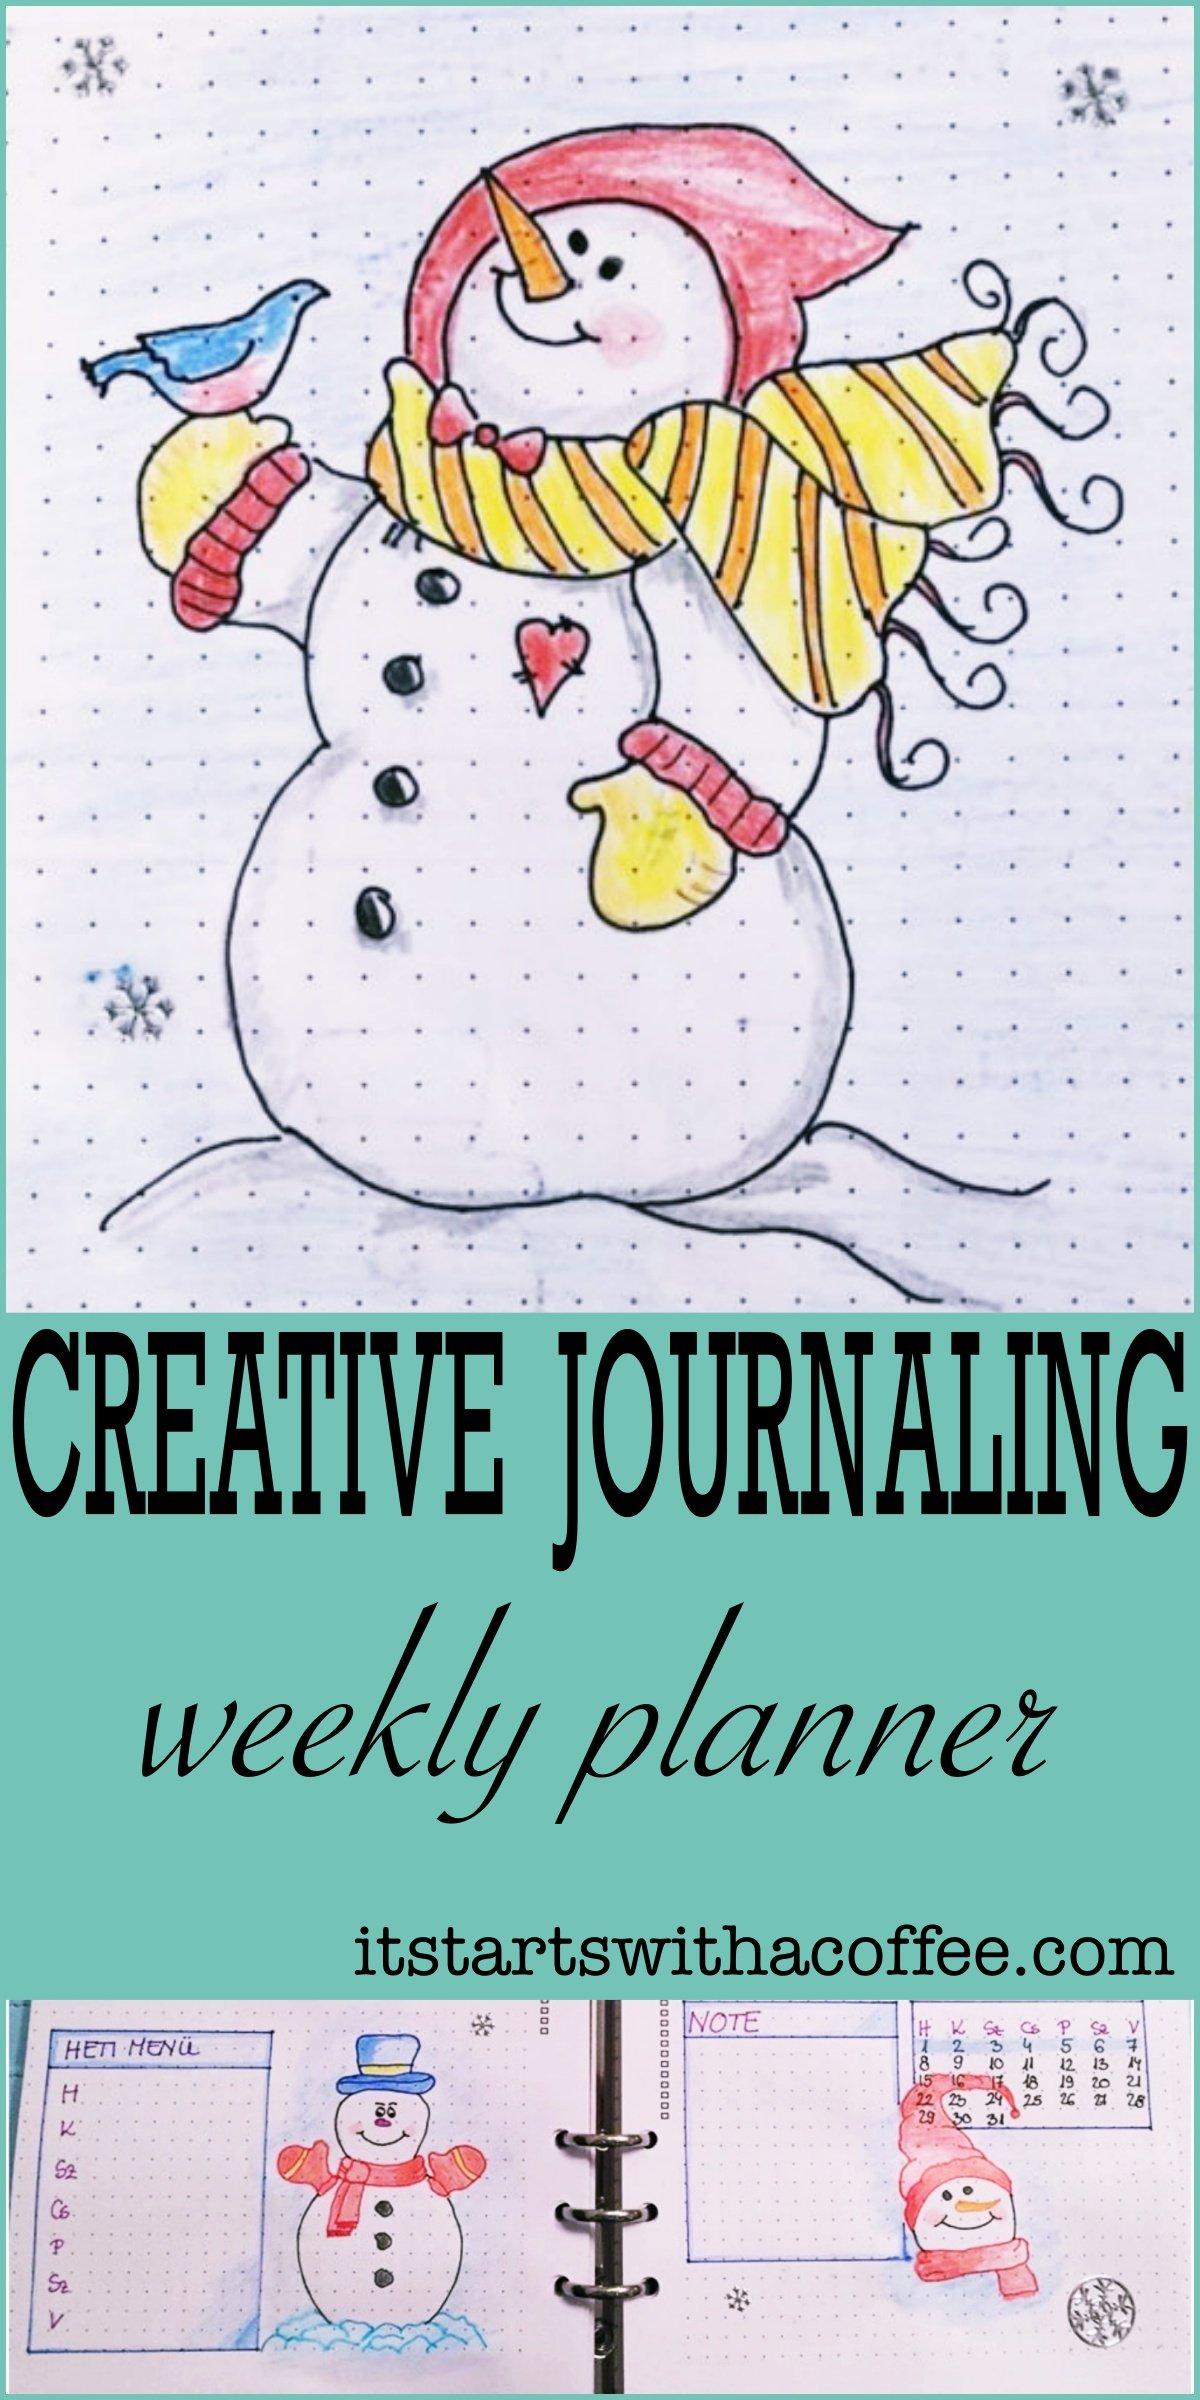 Creative journaling - January 2018 - itstartswithacoffee.com #creativejournaling #journaling #weeklyplanner #weekly #planner #january #2018 #2018January